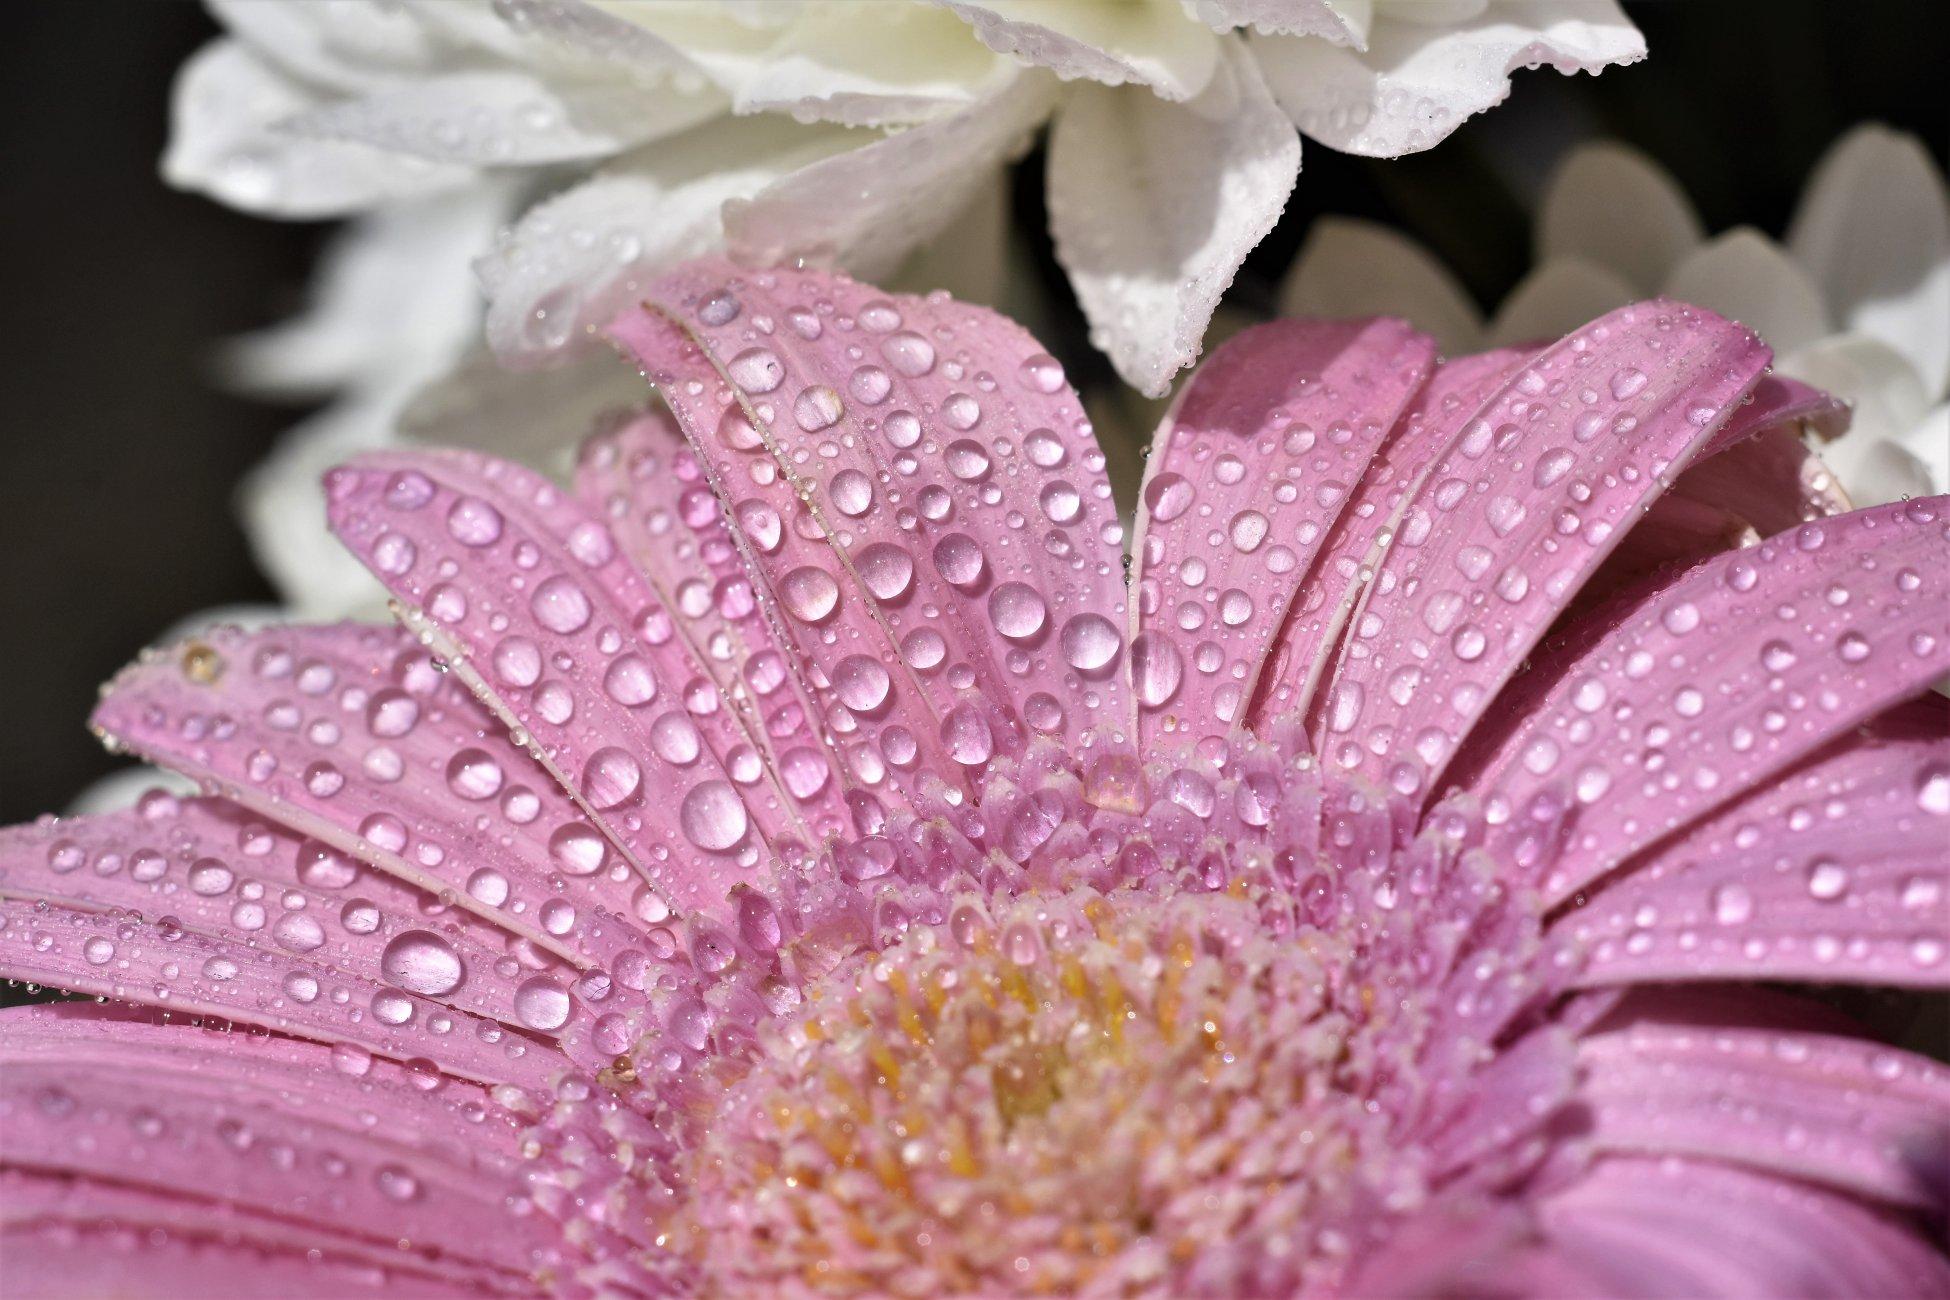 Water on flower